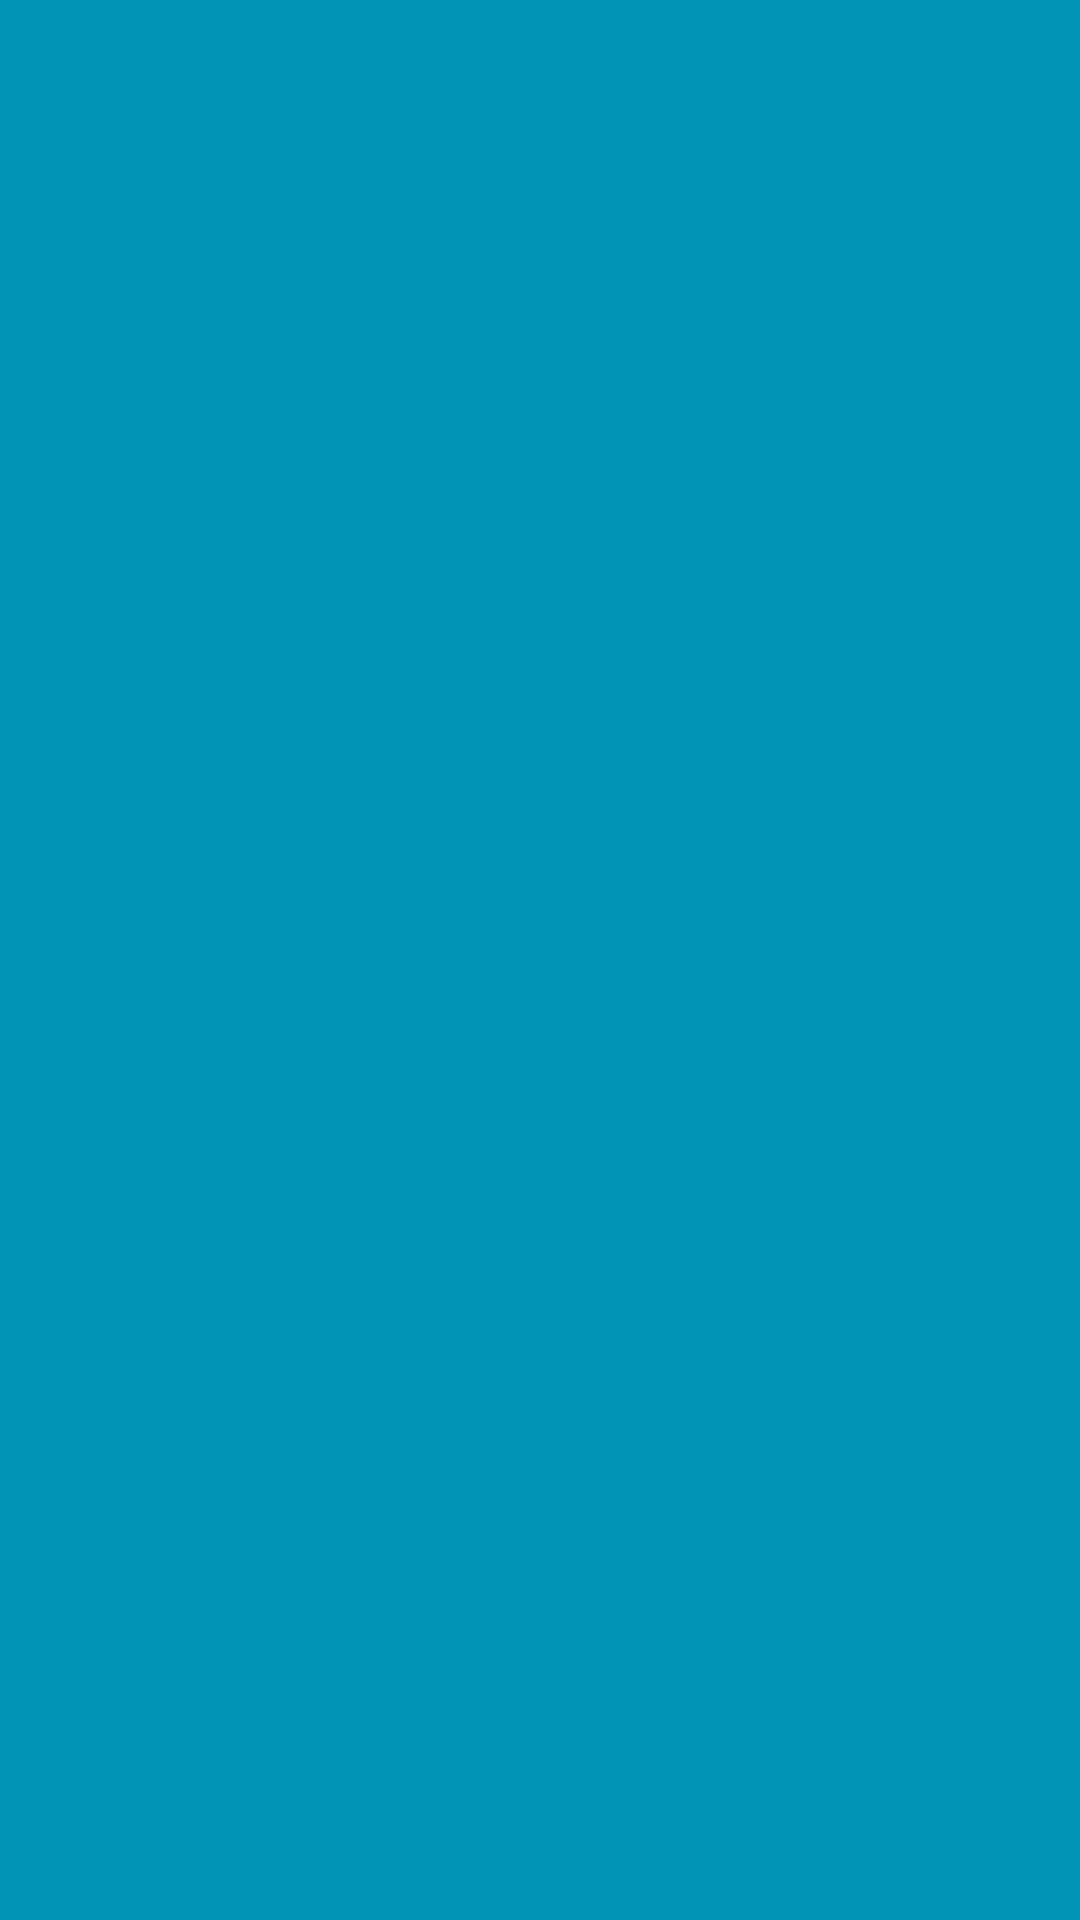 1080x1920 Bondi Blue Solid Color Background